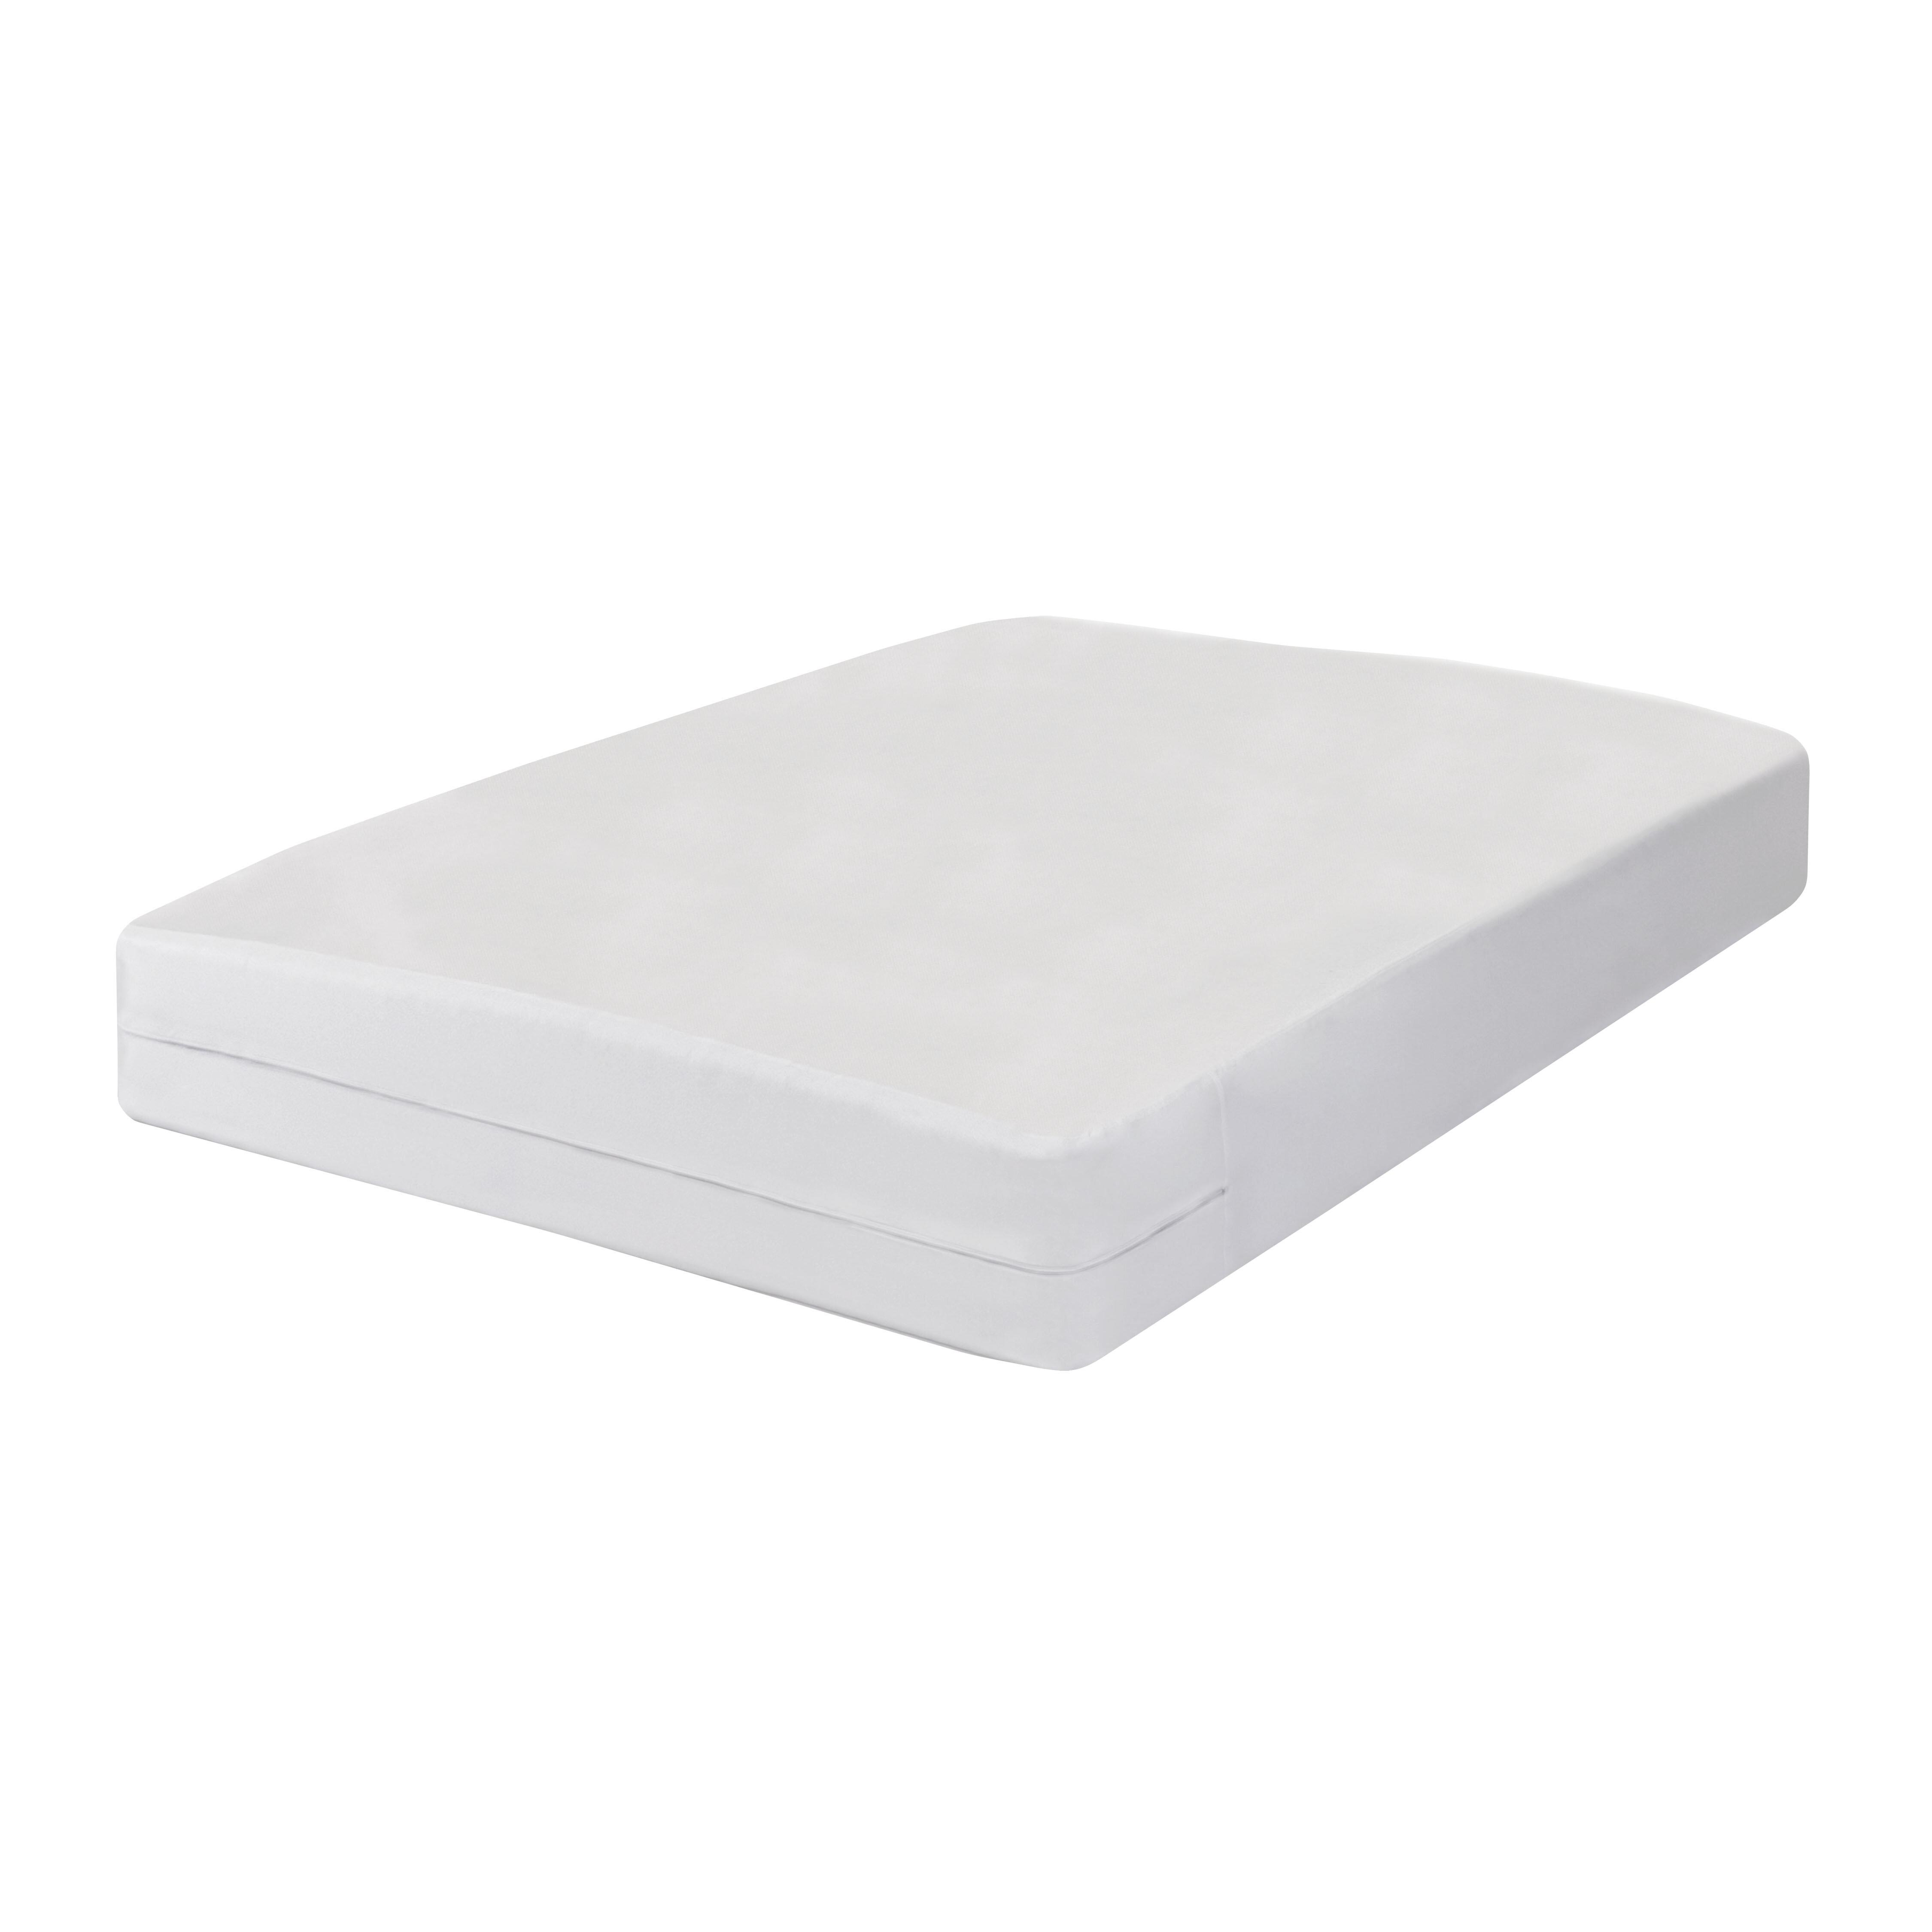 Fresh Ideas All In One Bed Bug Blocker Non Woven Box